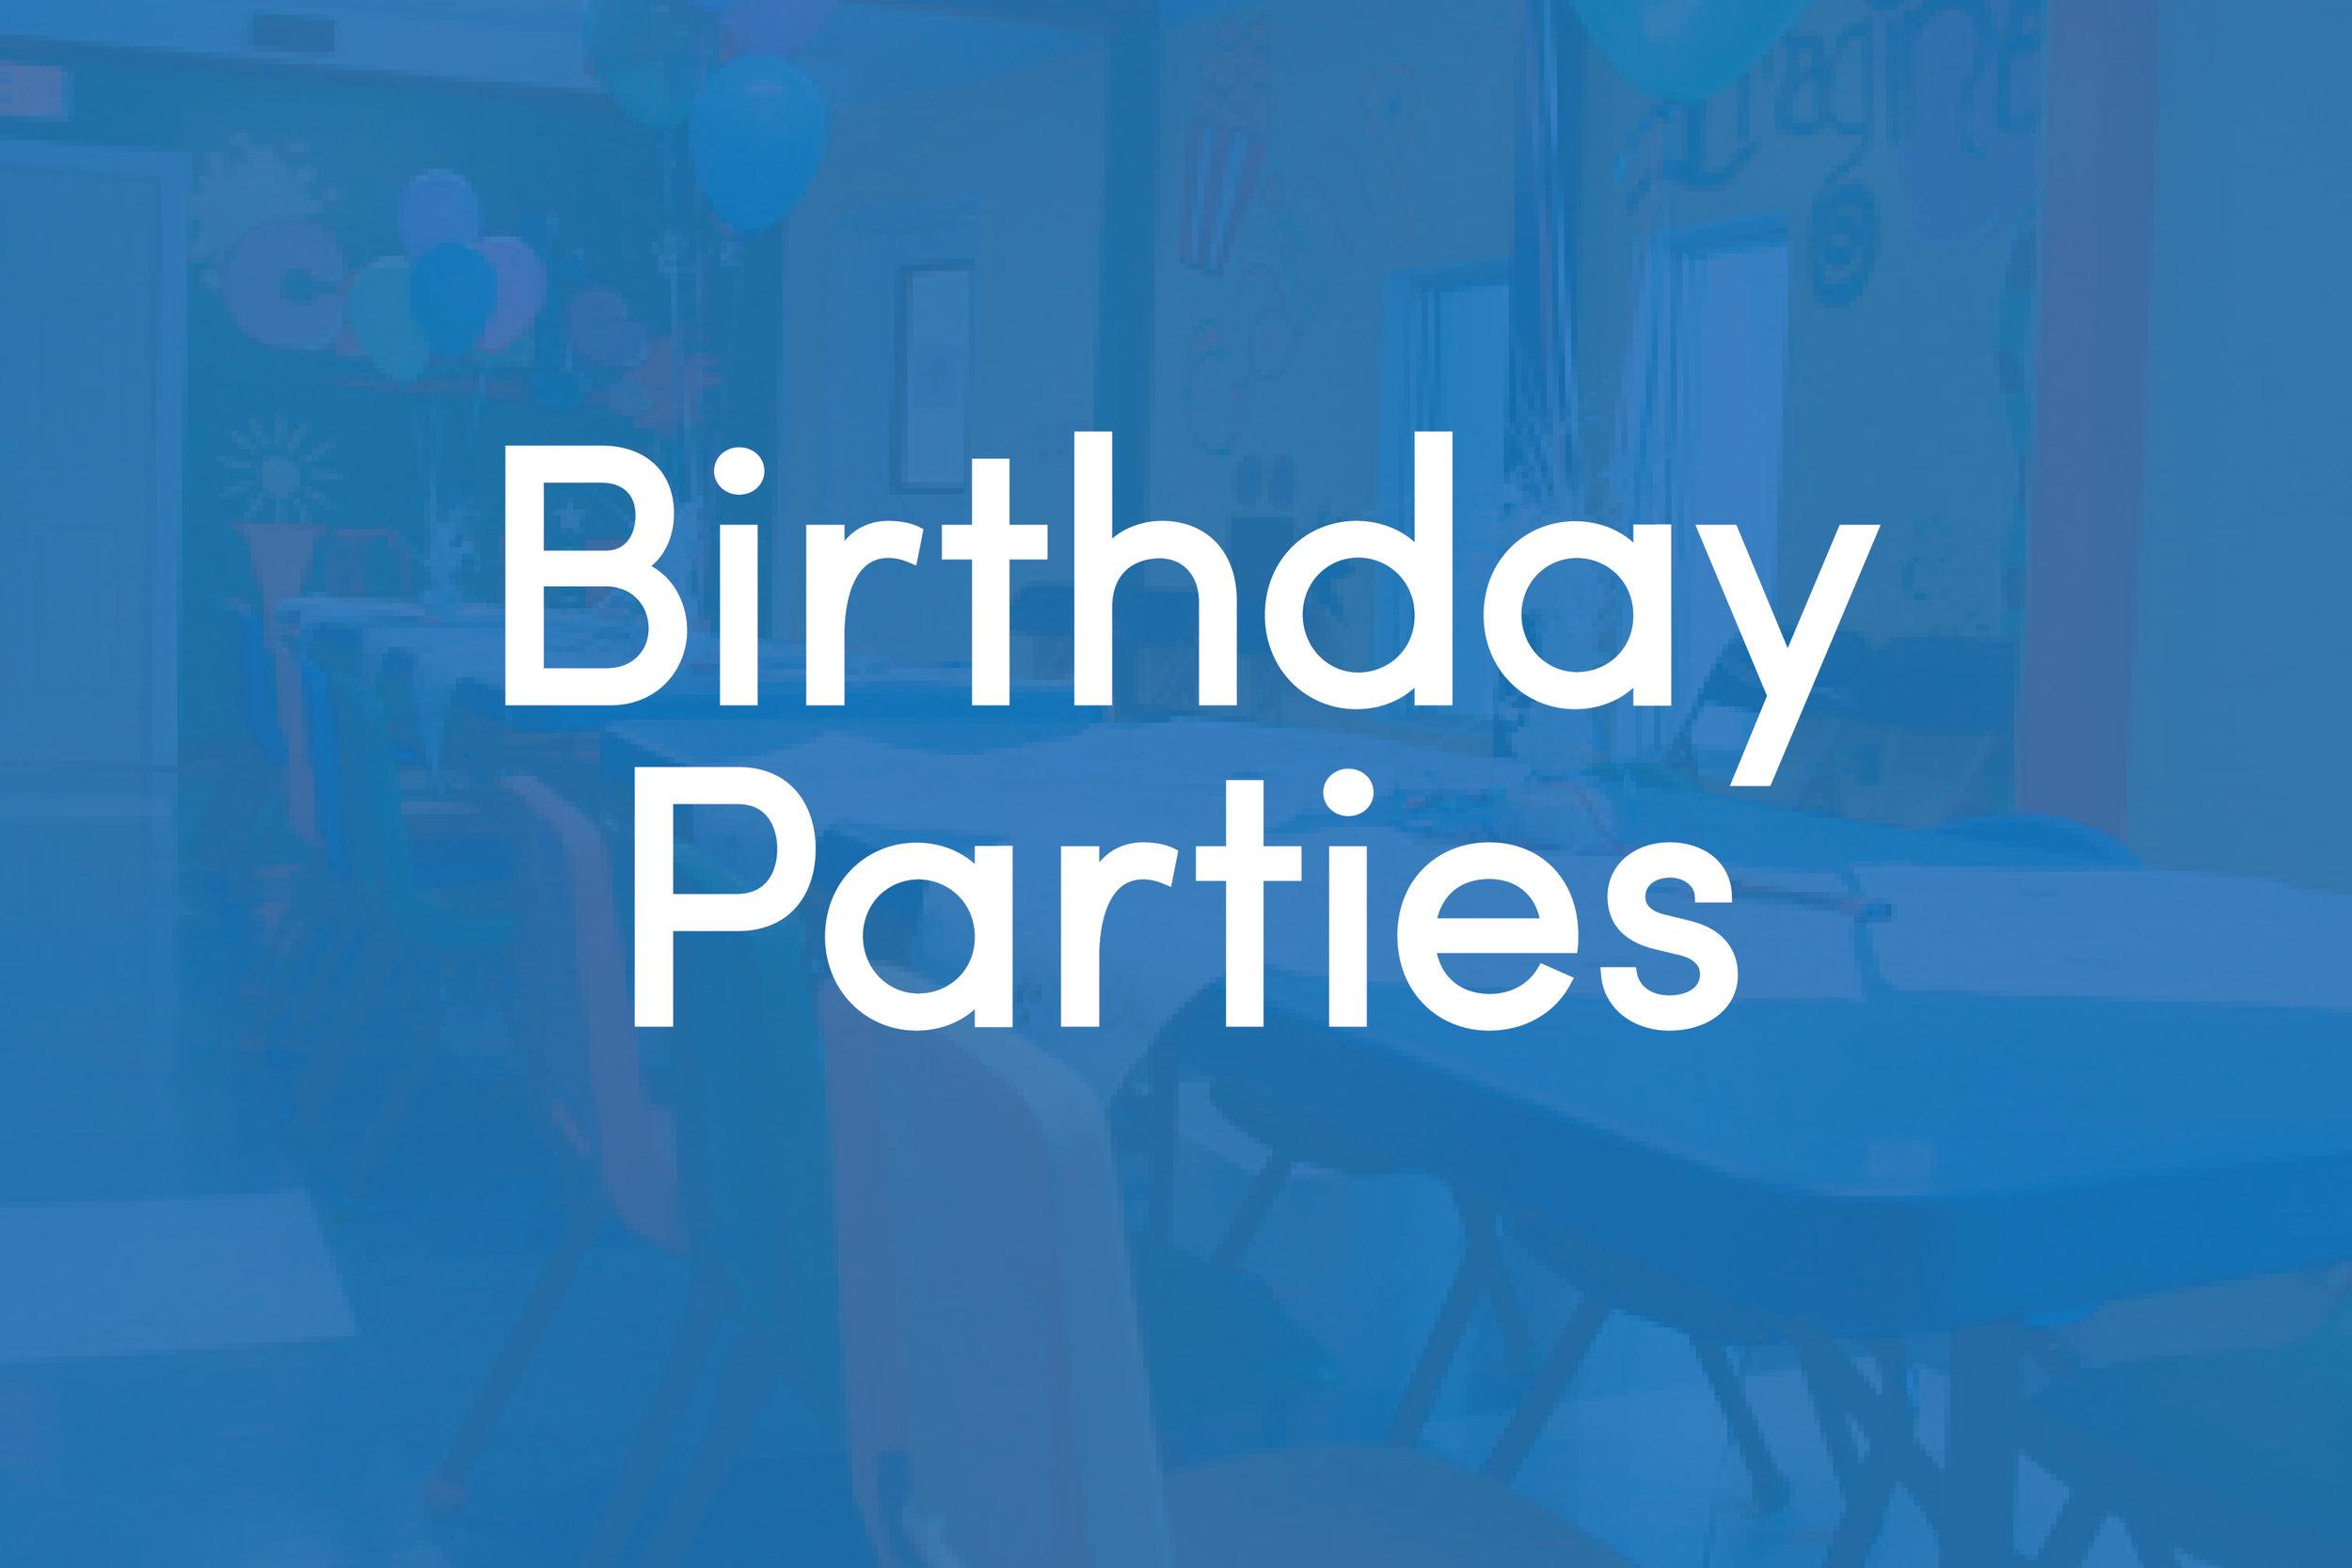 parties_banner.jpg